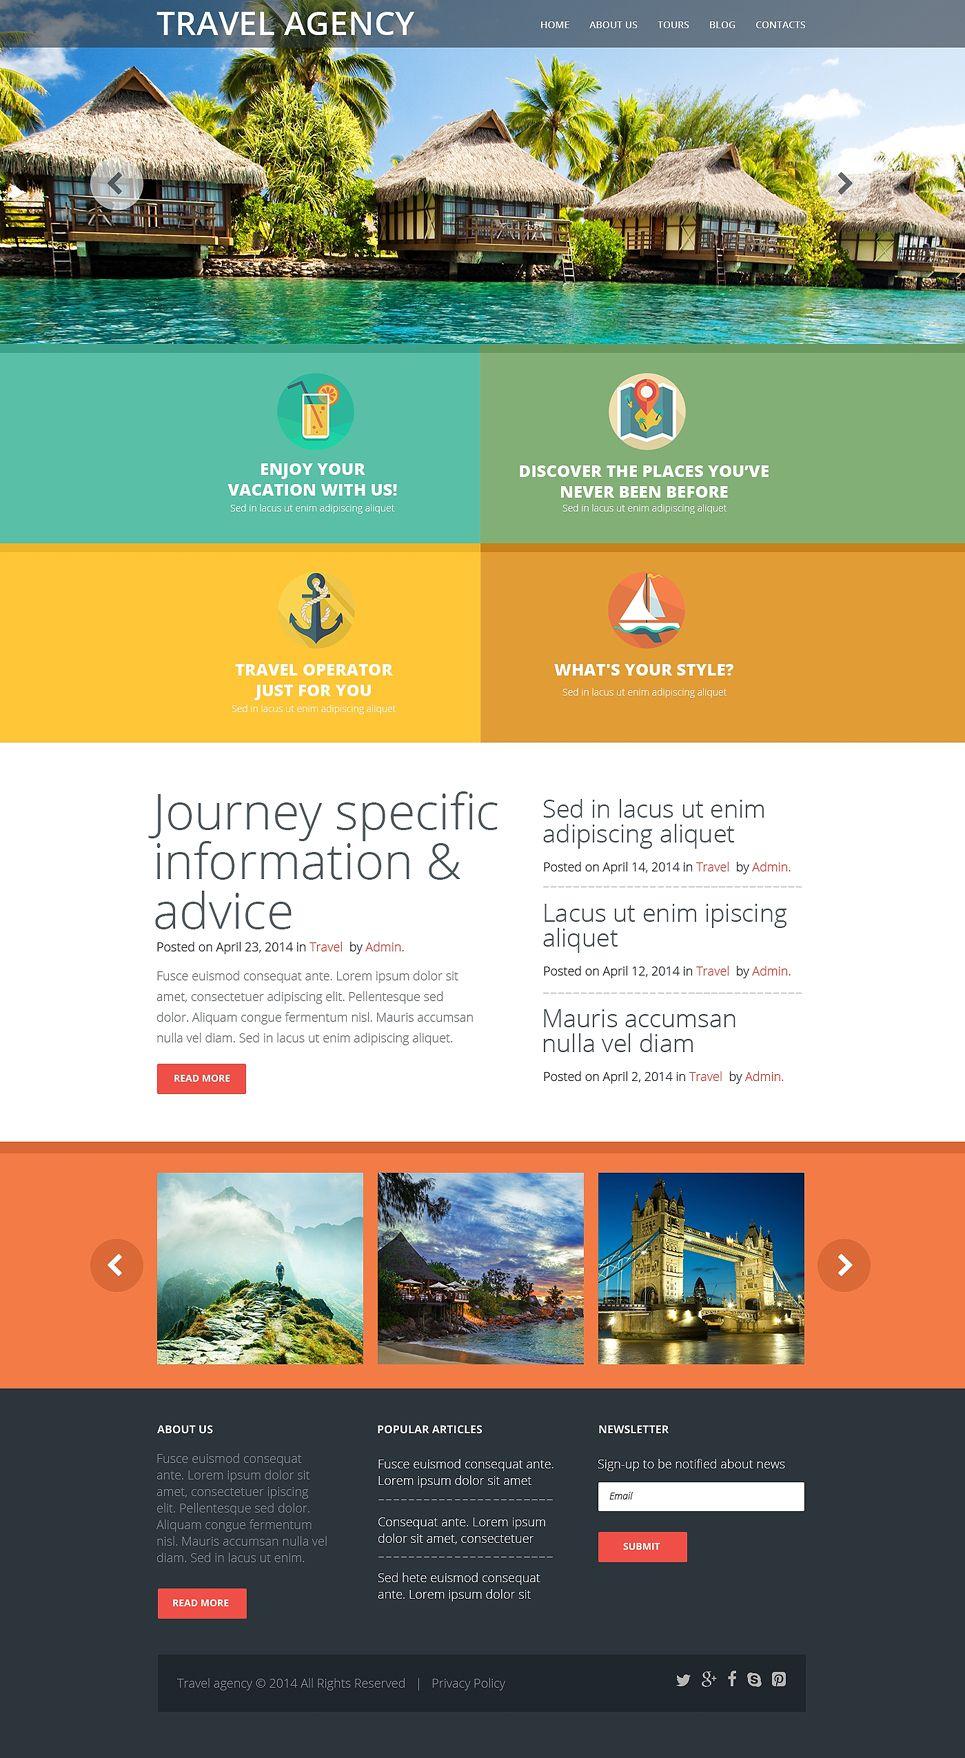 Travel Agency Website >> Travel Agency Responsive Website Template 50997 Travel